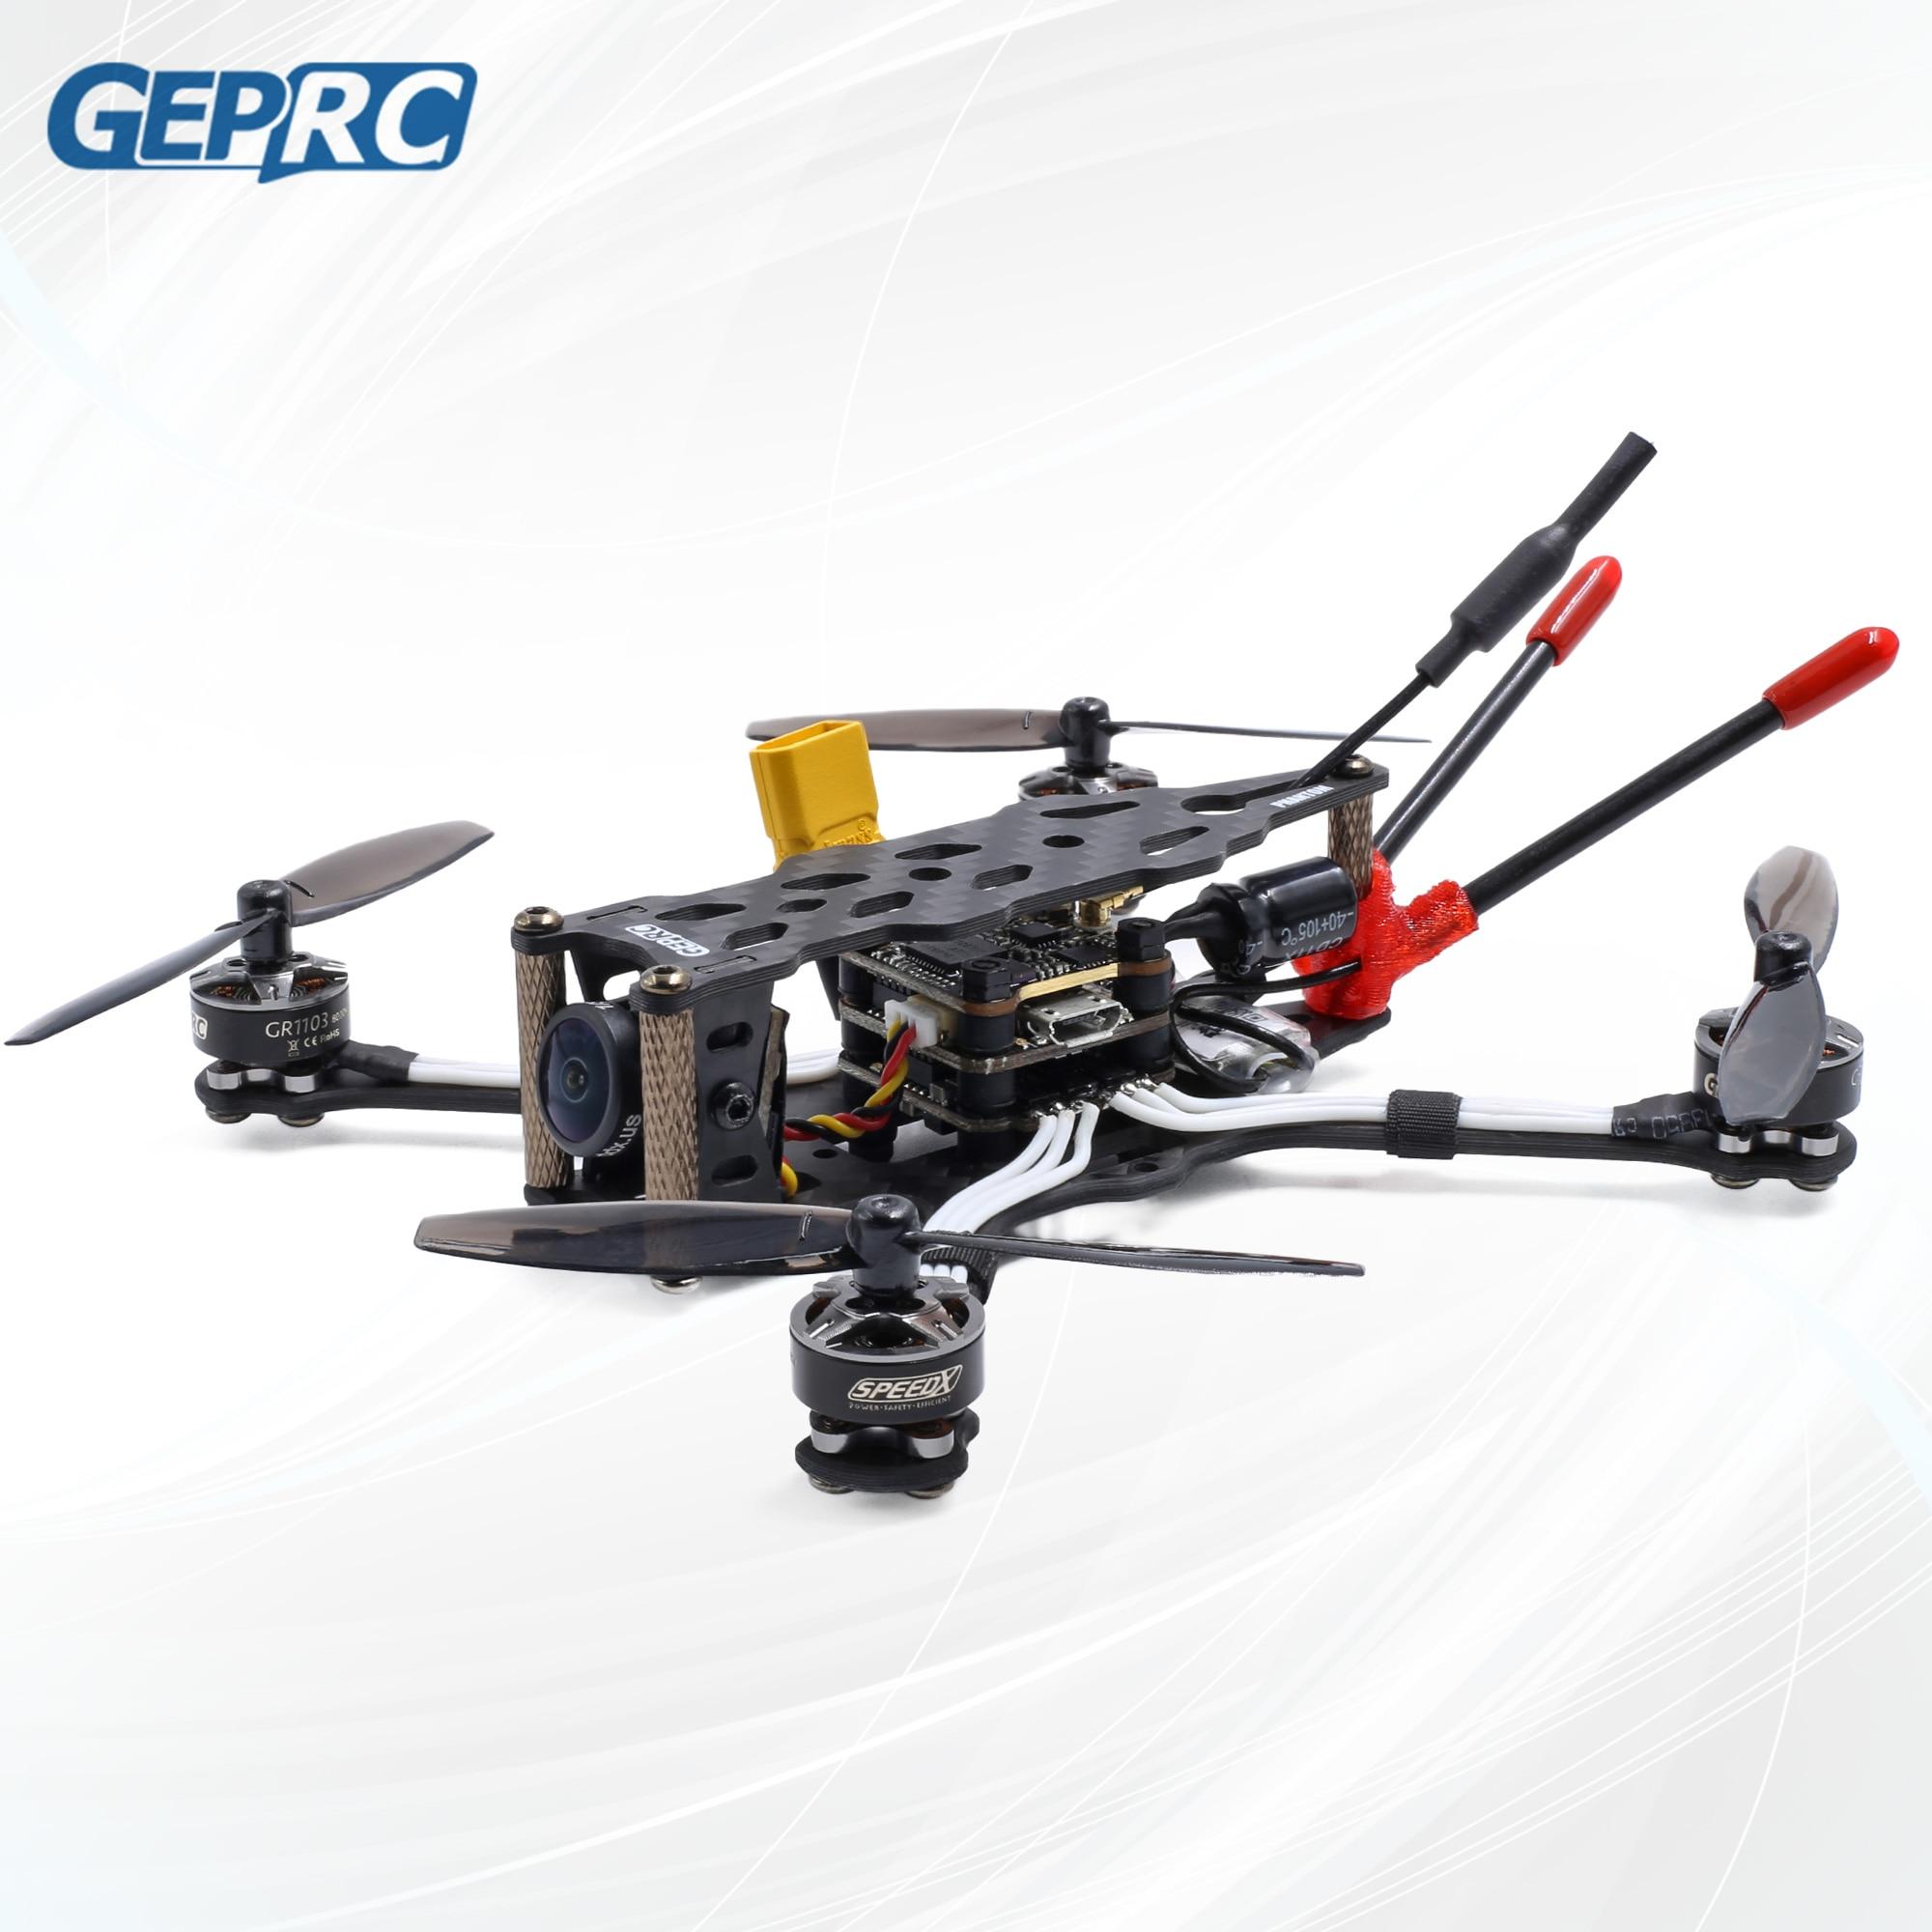 GEPRC Smart Phantom 2.5